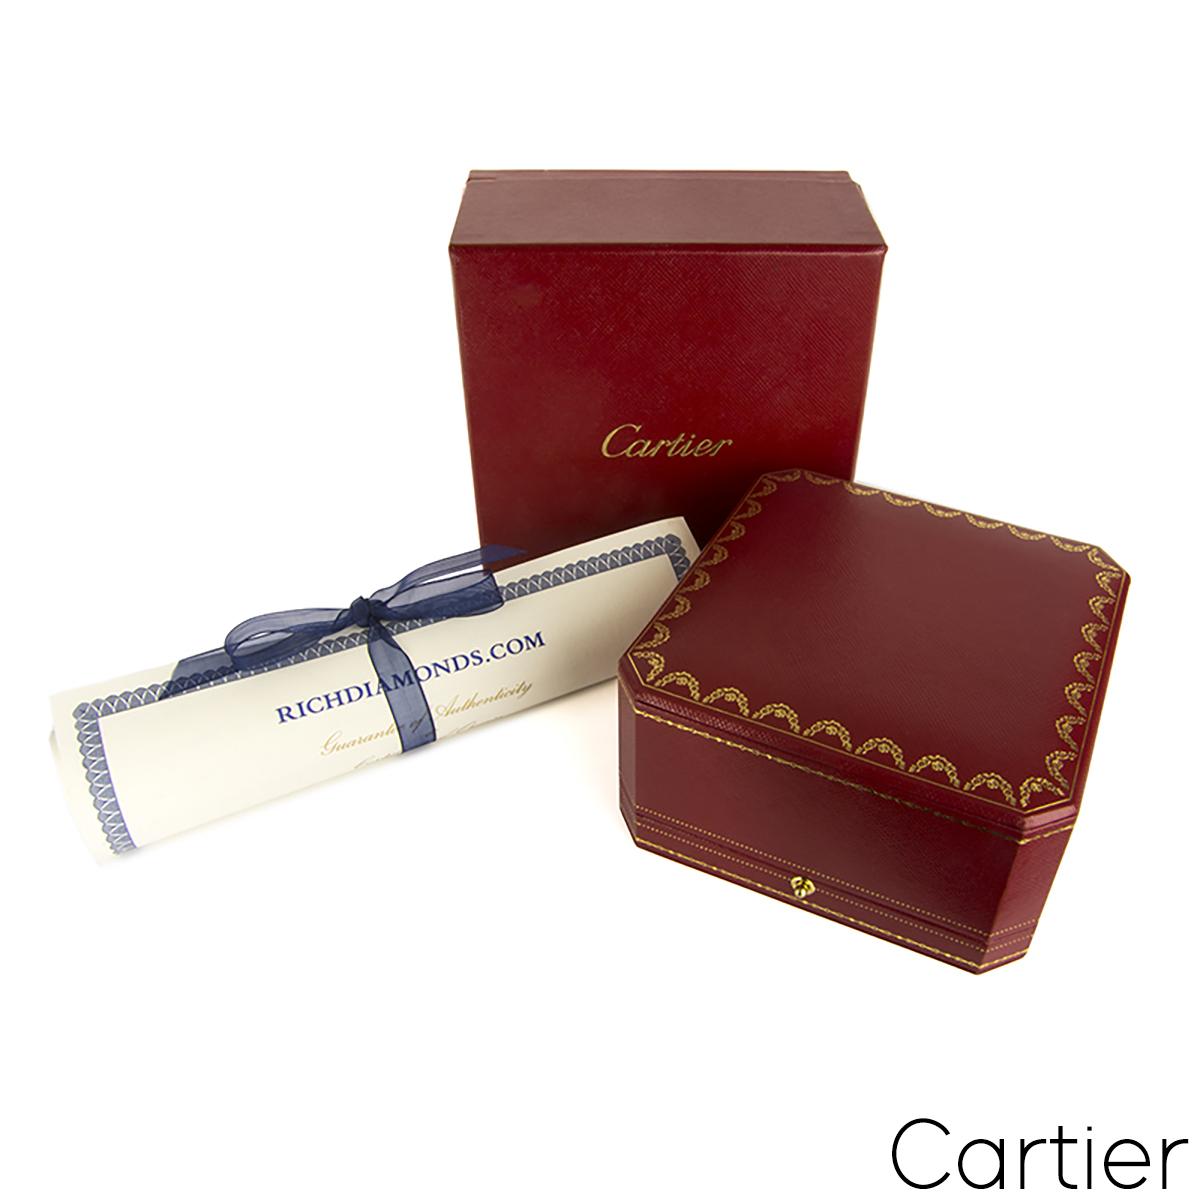 Cartier White Gold Pave Diamond & Ceramic Love Bracelet Size 20 N6032420